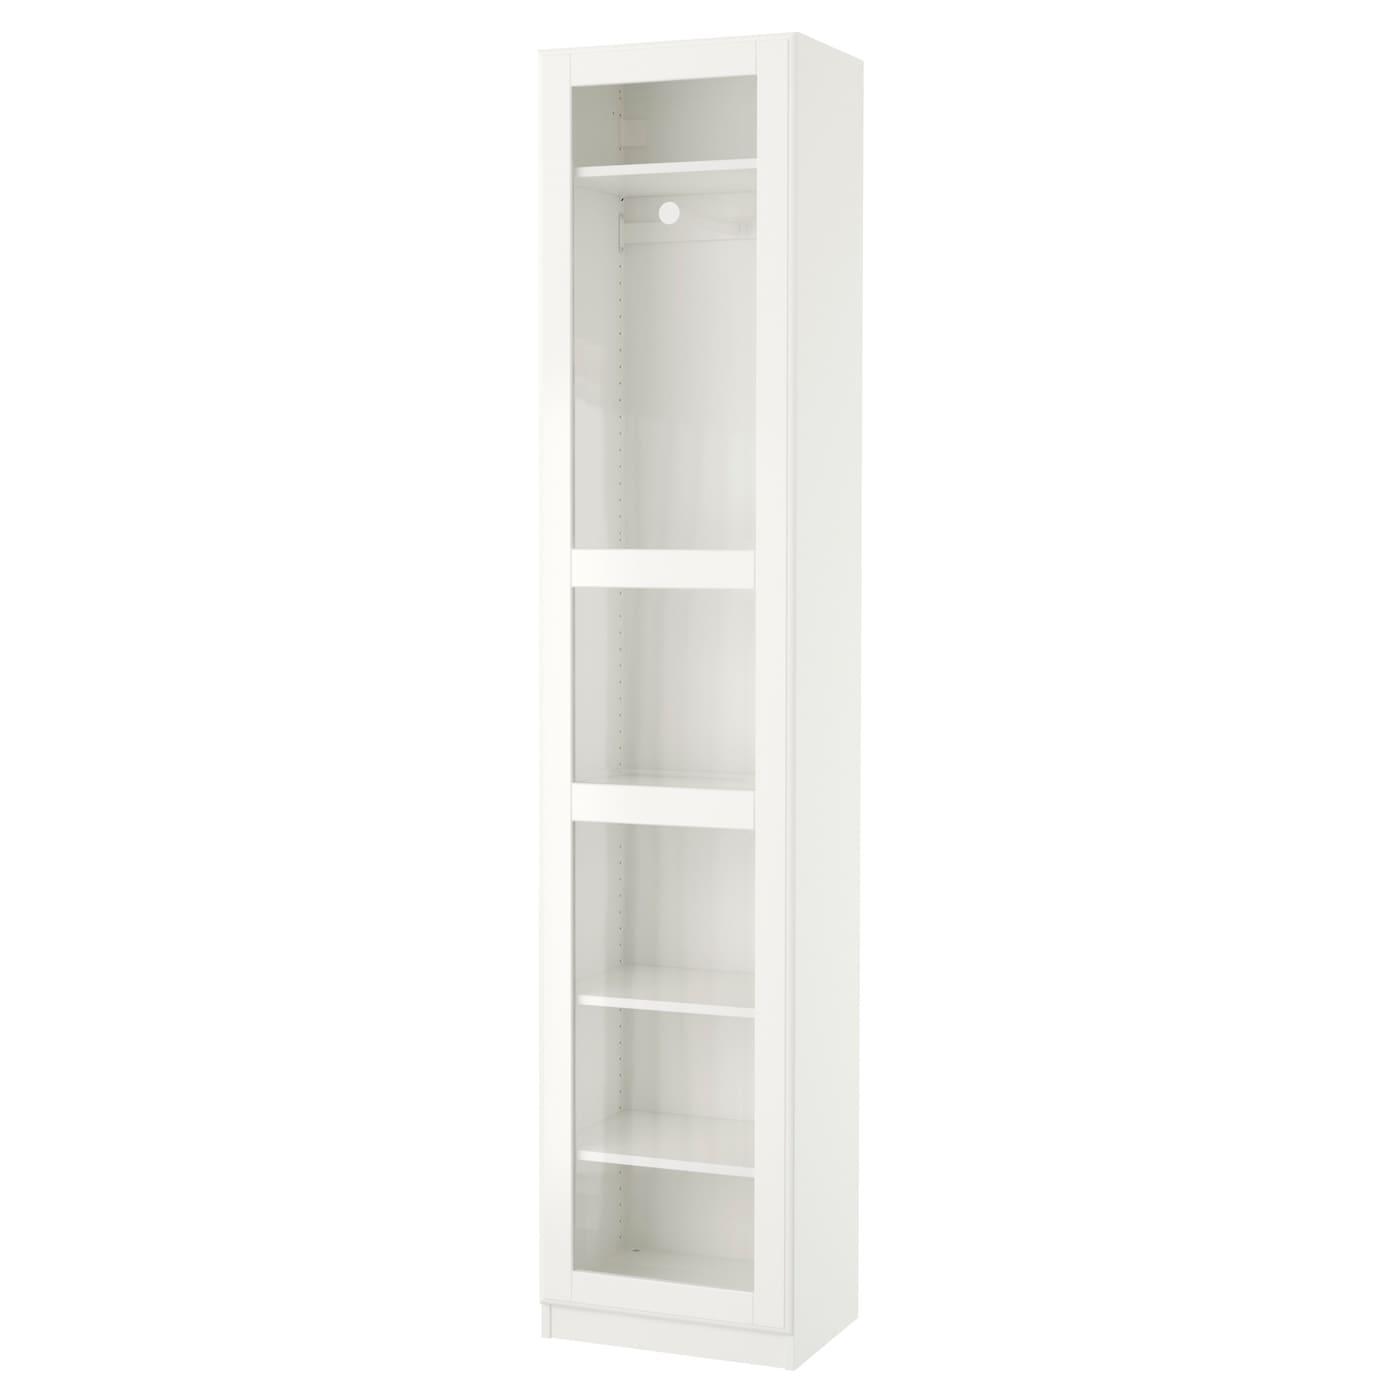 Pax armoire penderie blanc tyssedal verre 50x38x236 cm ikea - Armoire peu profonde ...